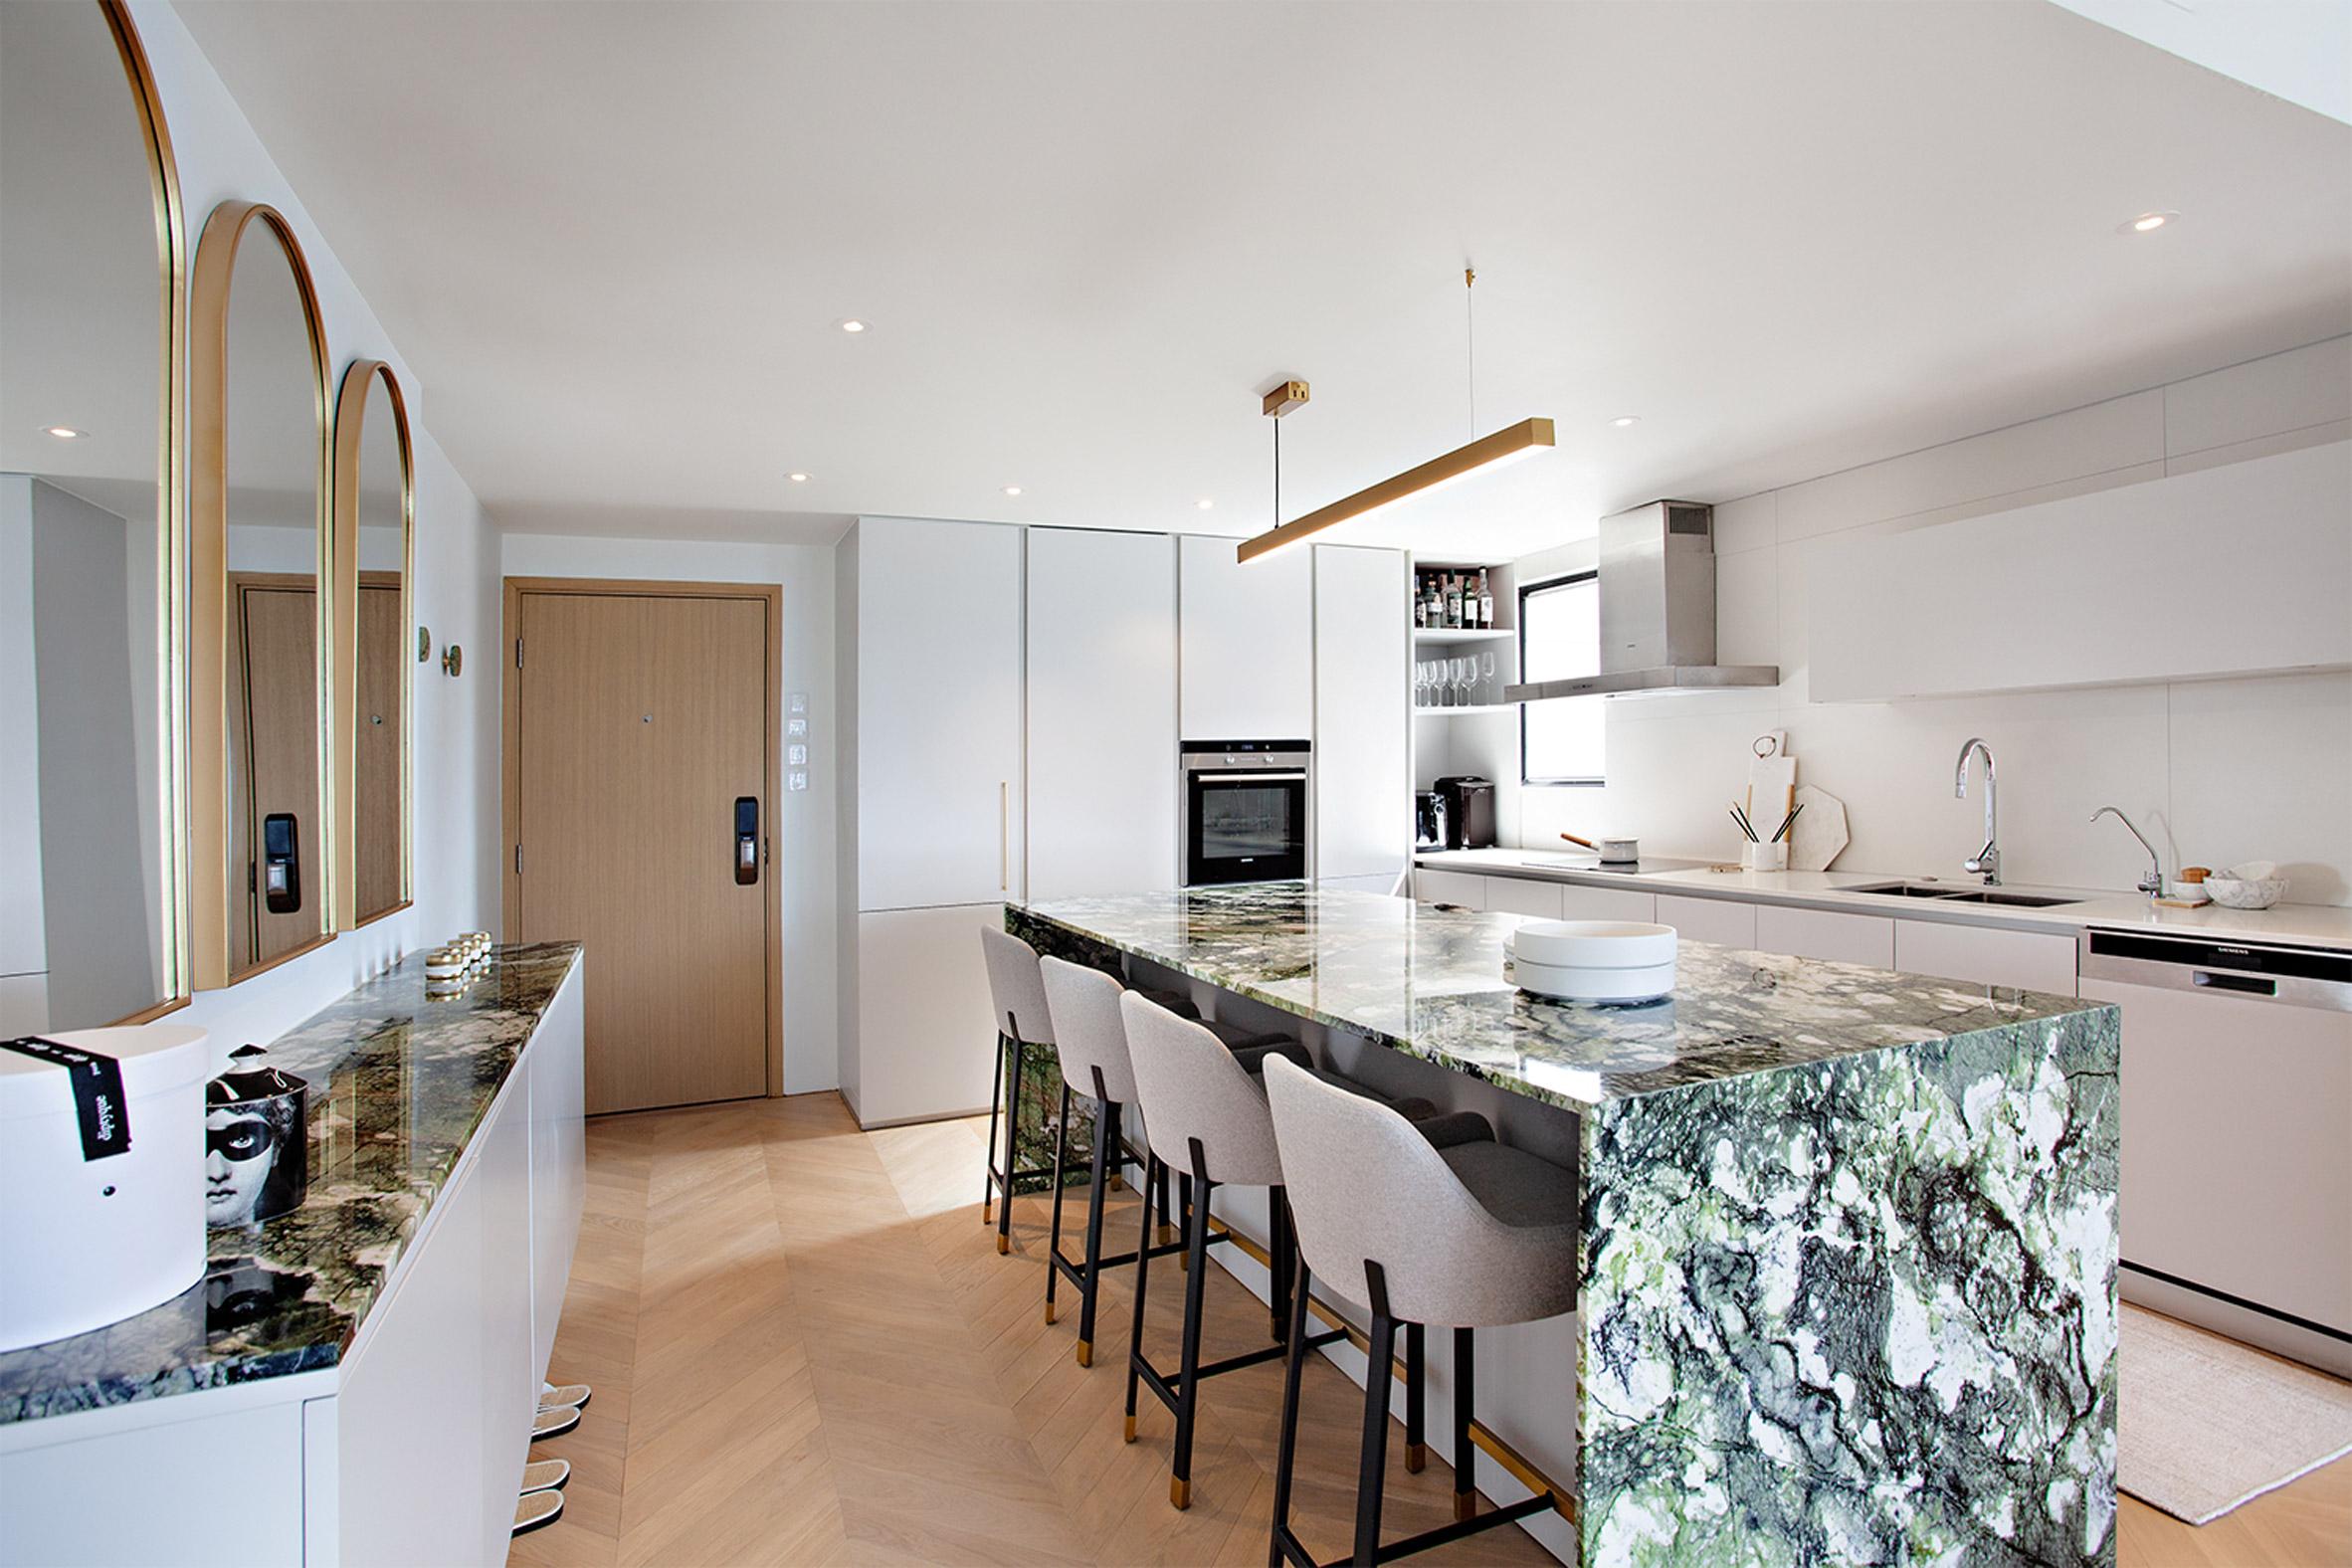 Green marble kitchen table in white kitchen